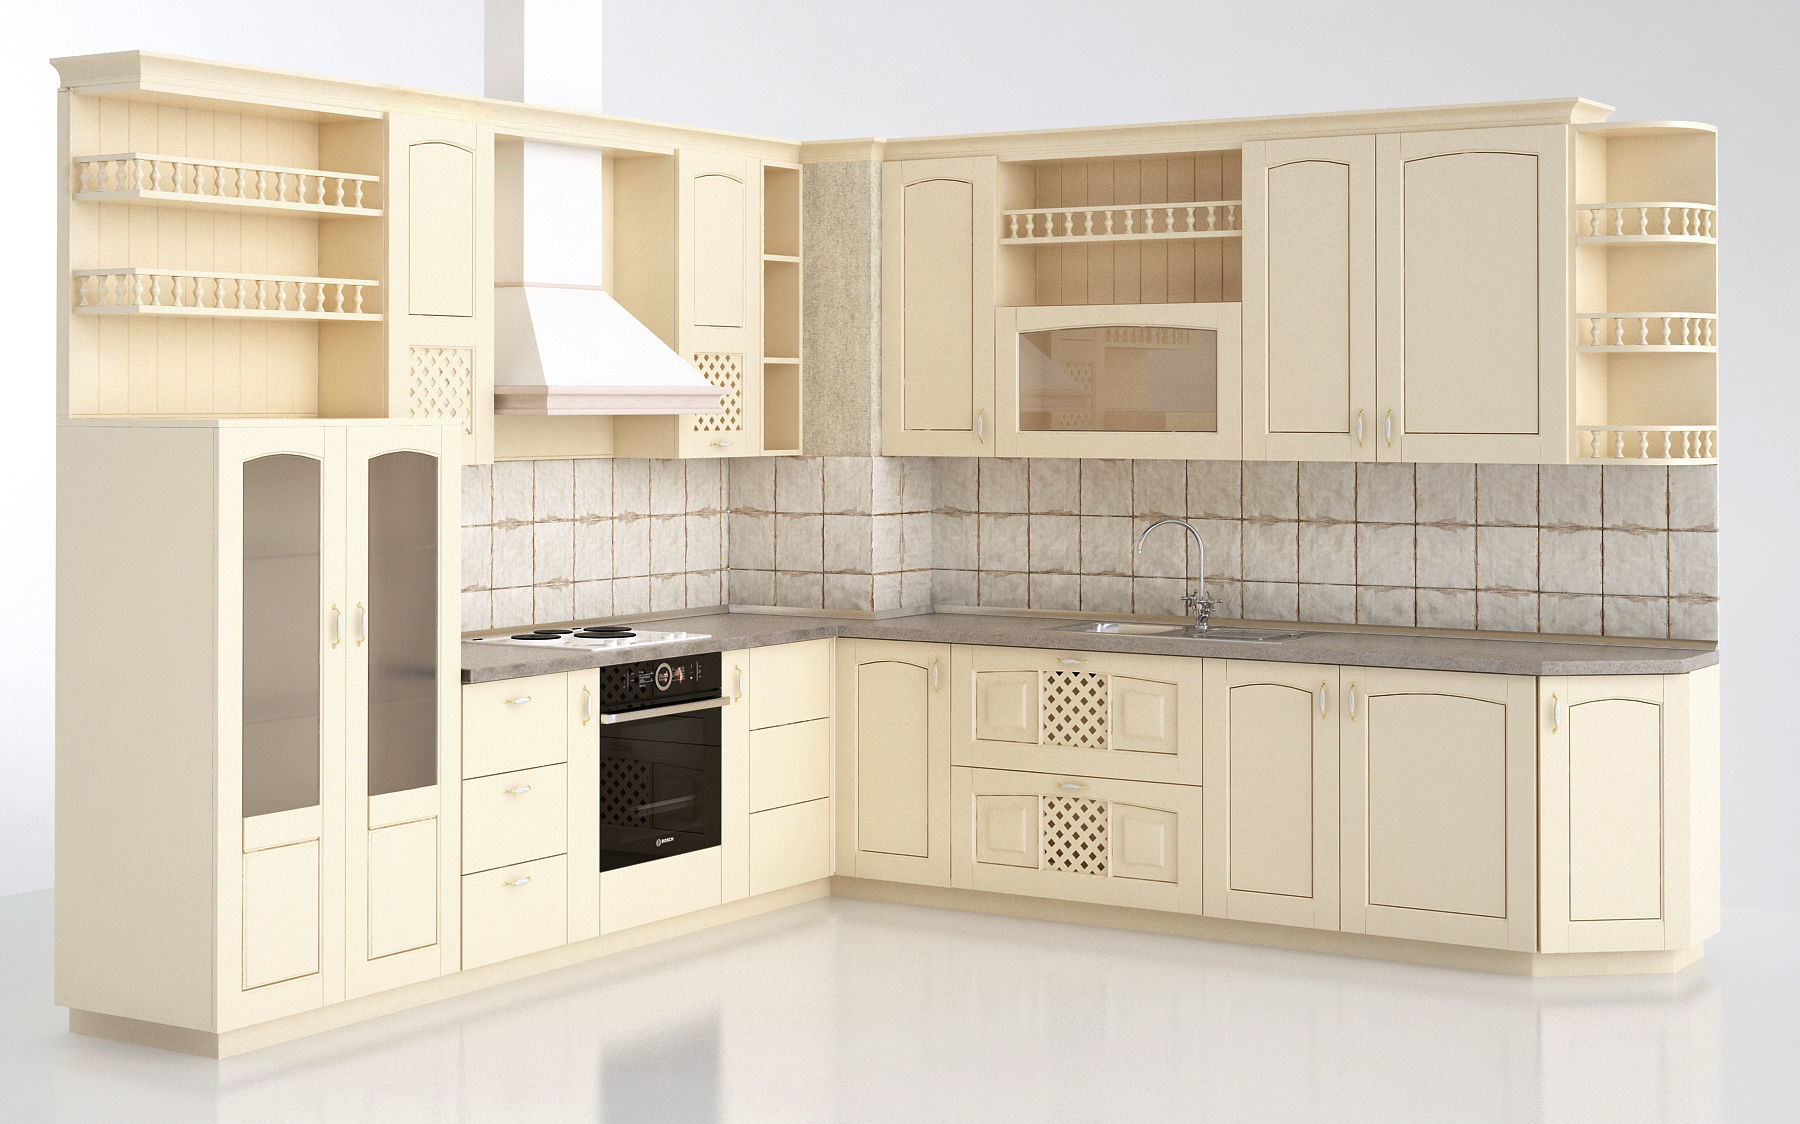 ginevra vaniglia kitchen Cucine classiche   3D model